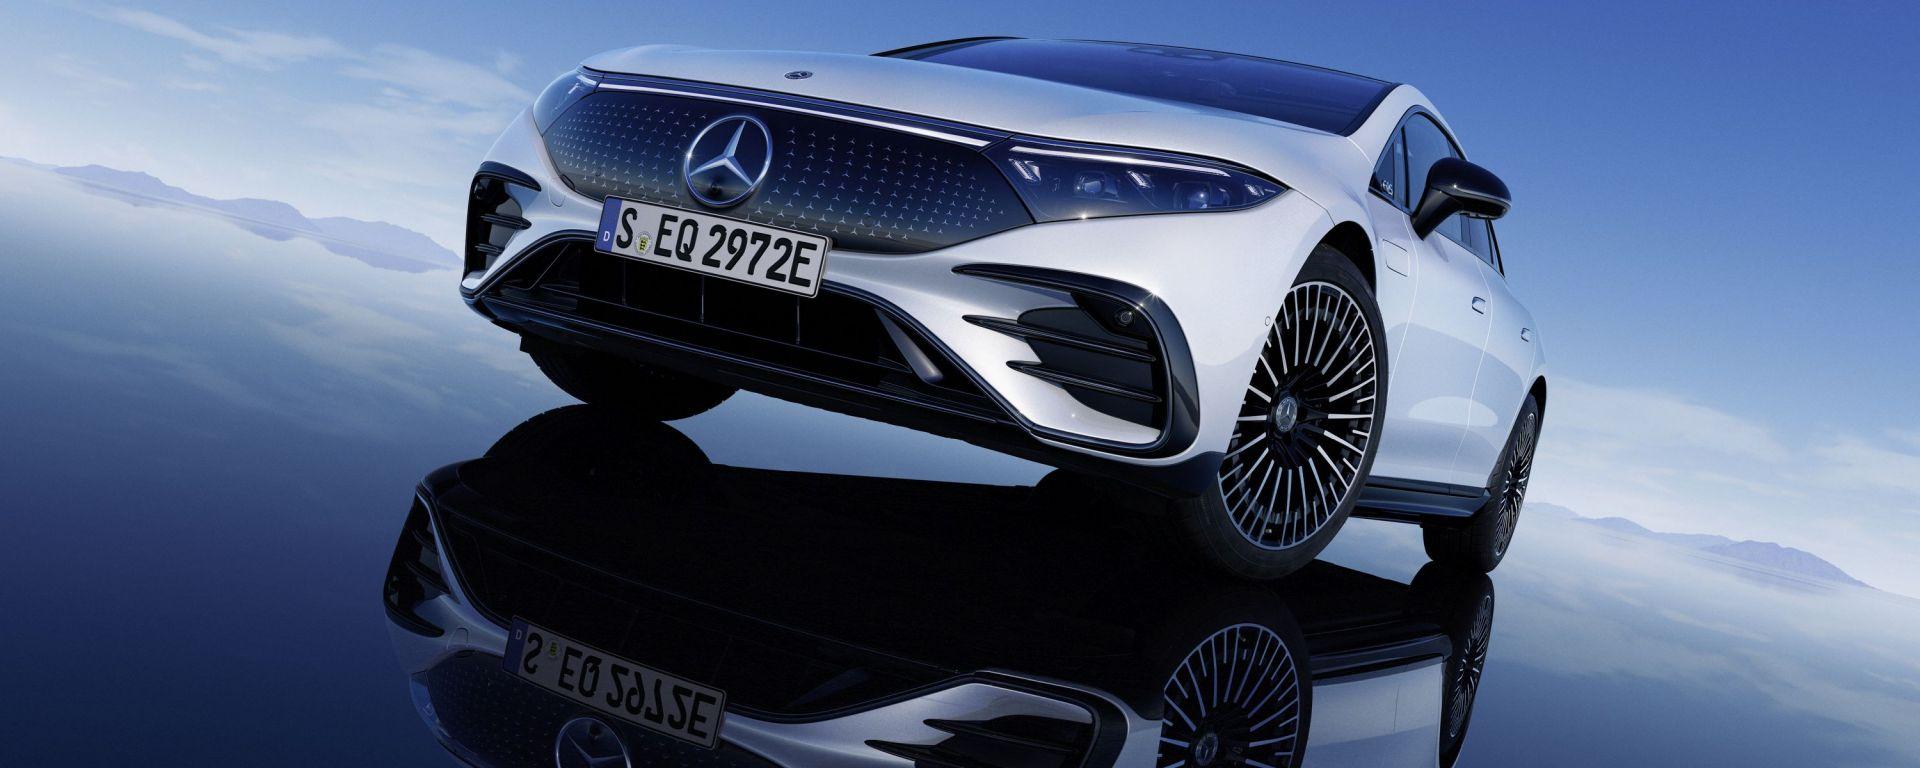 Nuova Mercedes EQS: l'ammiraglia diventa elettrica